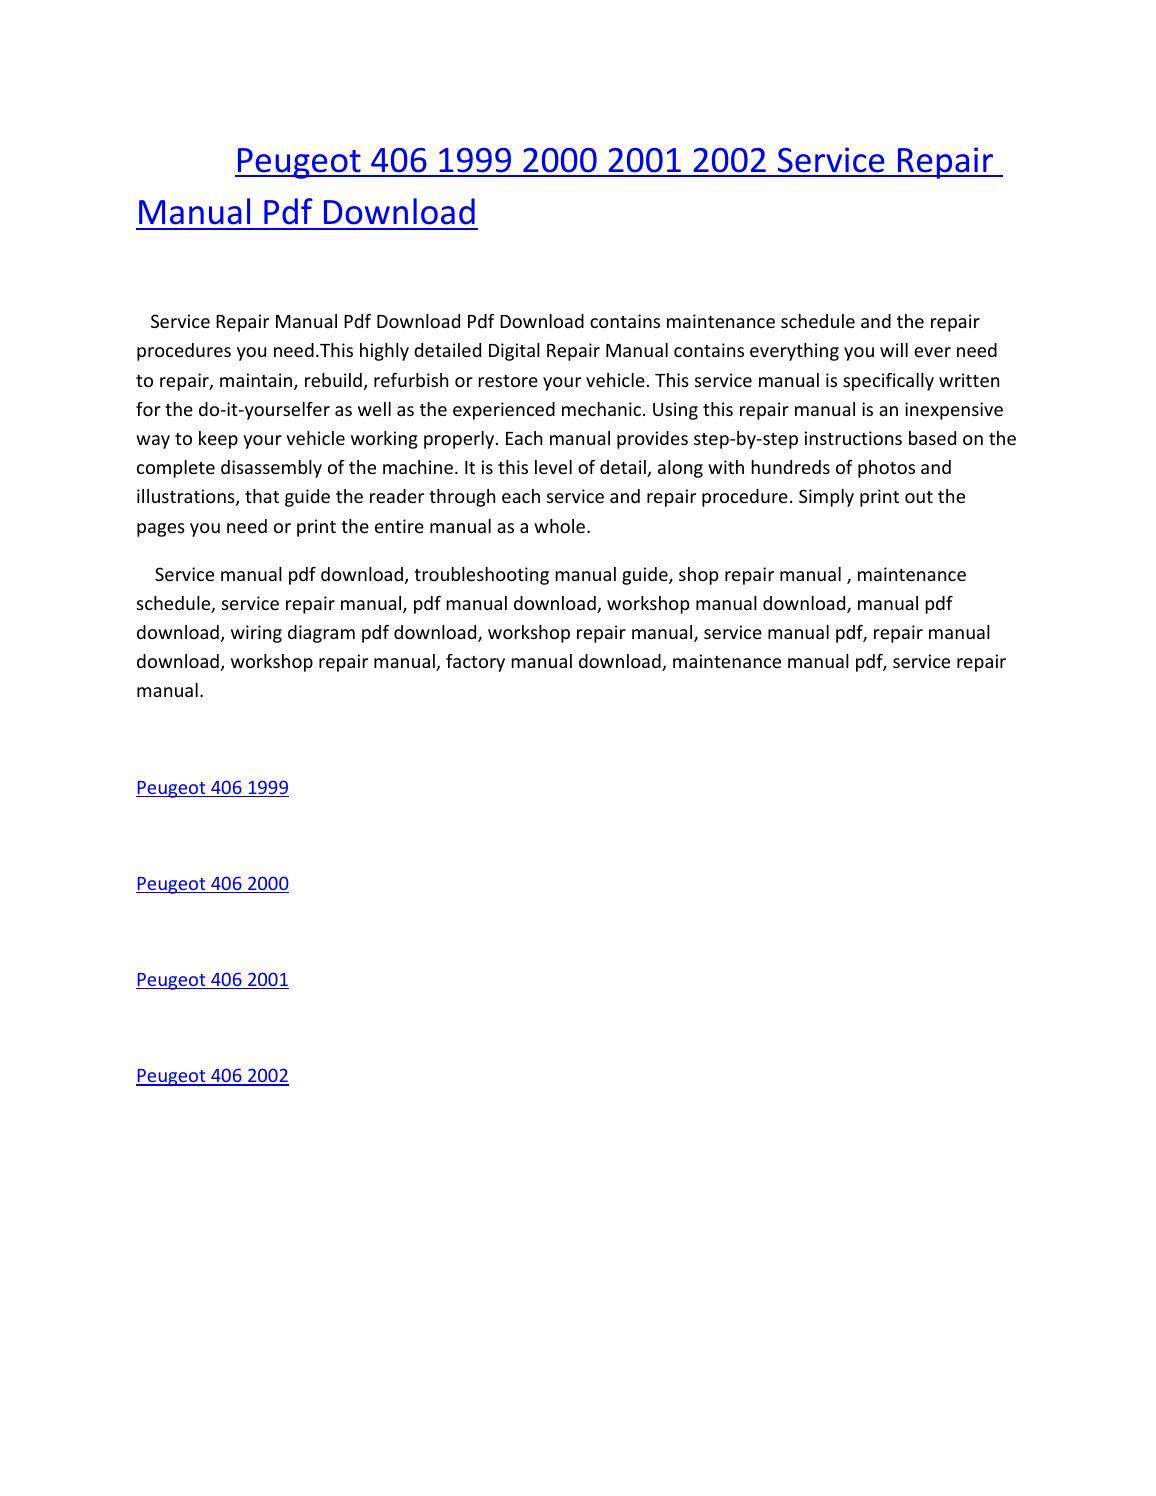 peugeot 406 1999 2000 2001 2002 service repair manual pdf download by  amurgului - issuu